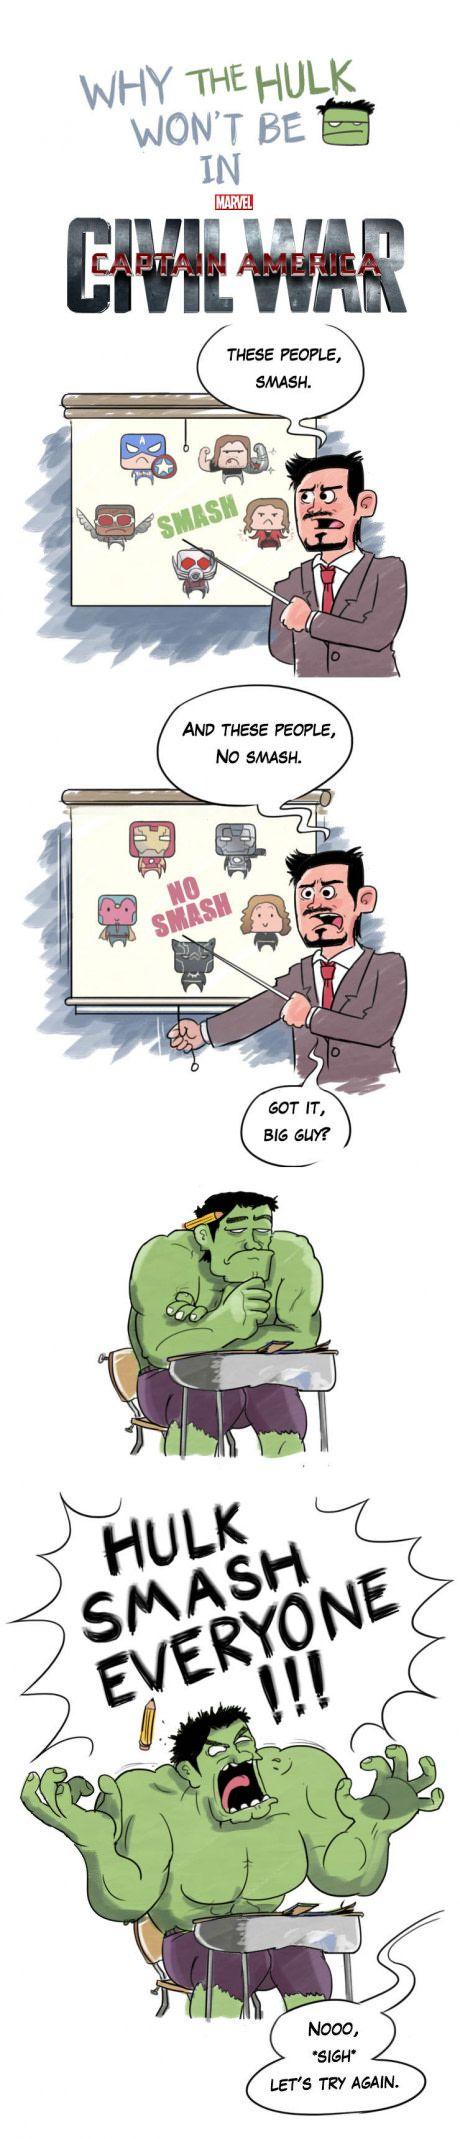 Why The Hulk won't be in Civil War ~Art by Markmak~